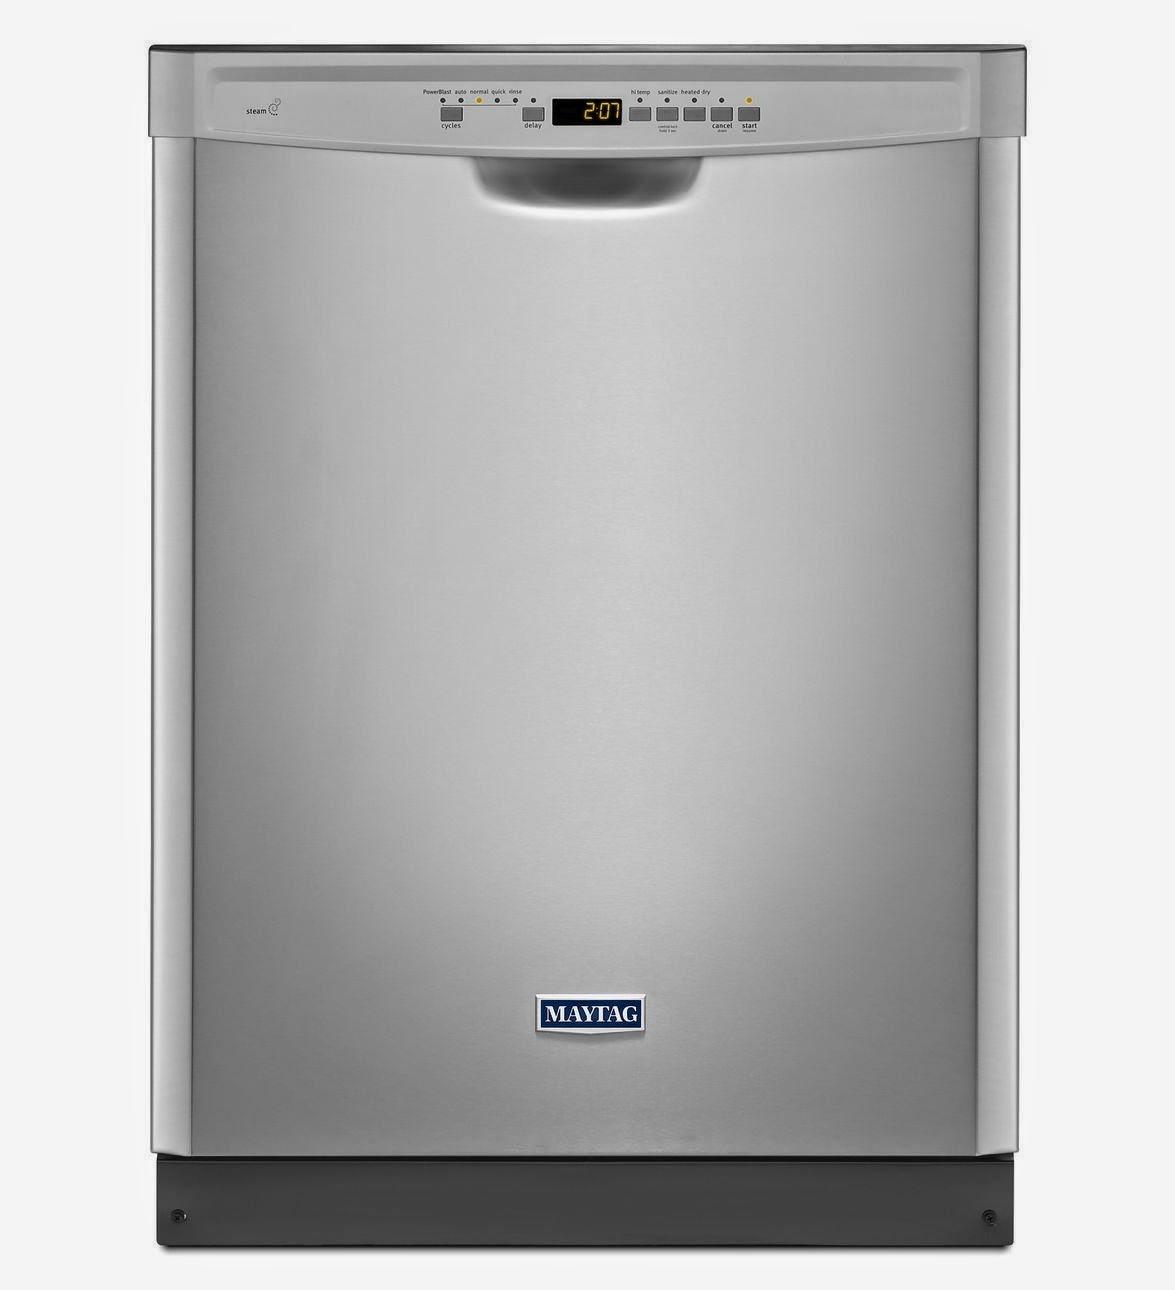 Maytag Mdb7949sdm Dishwasher Reviews